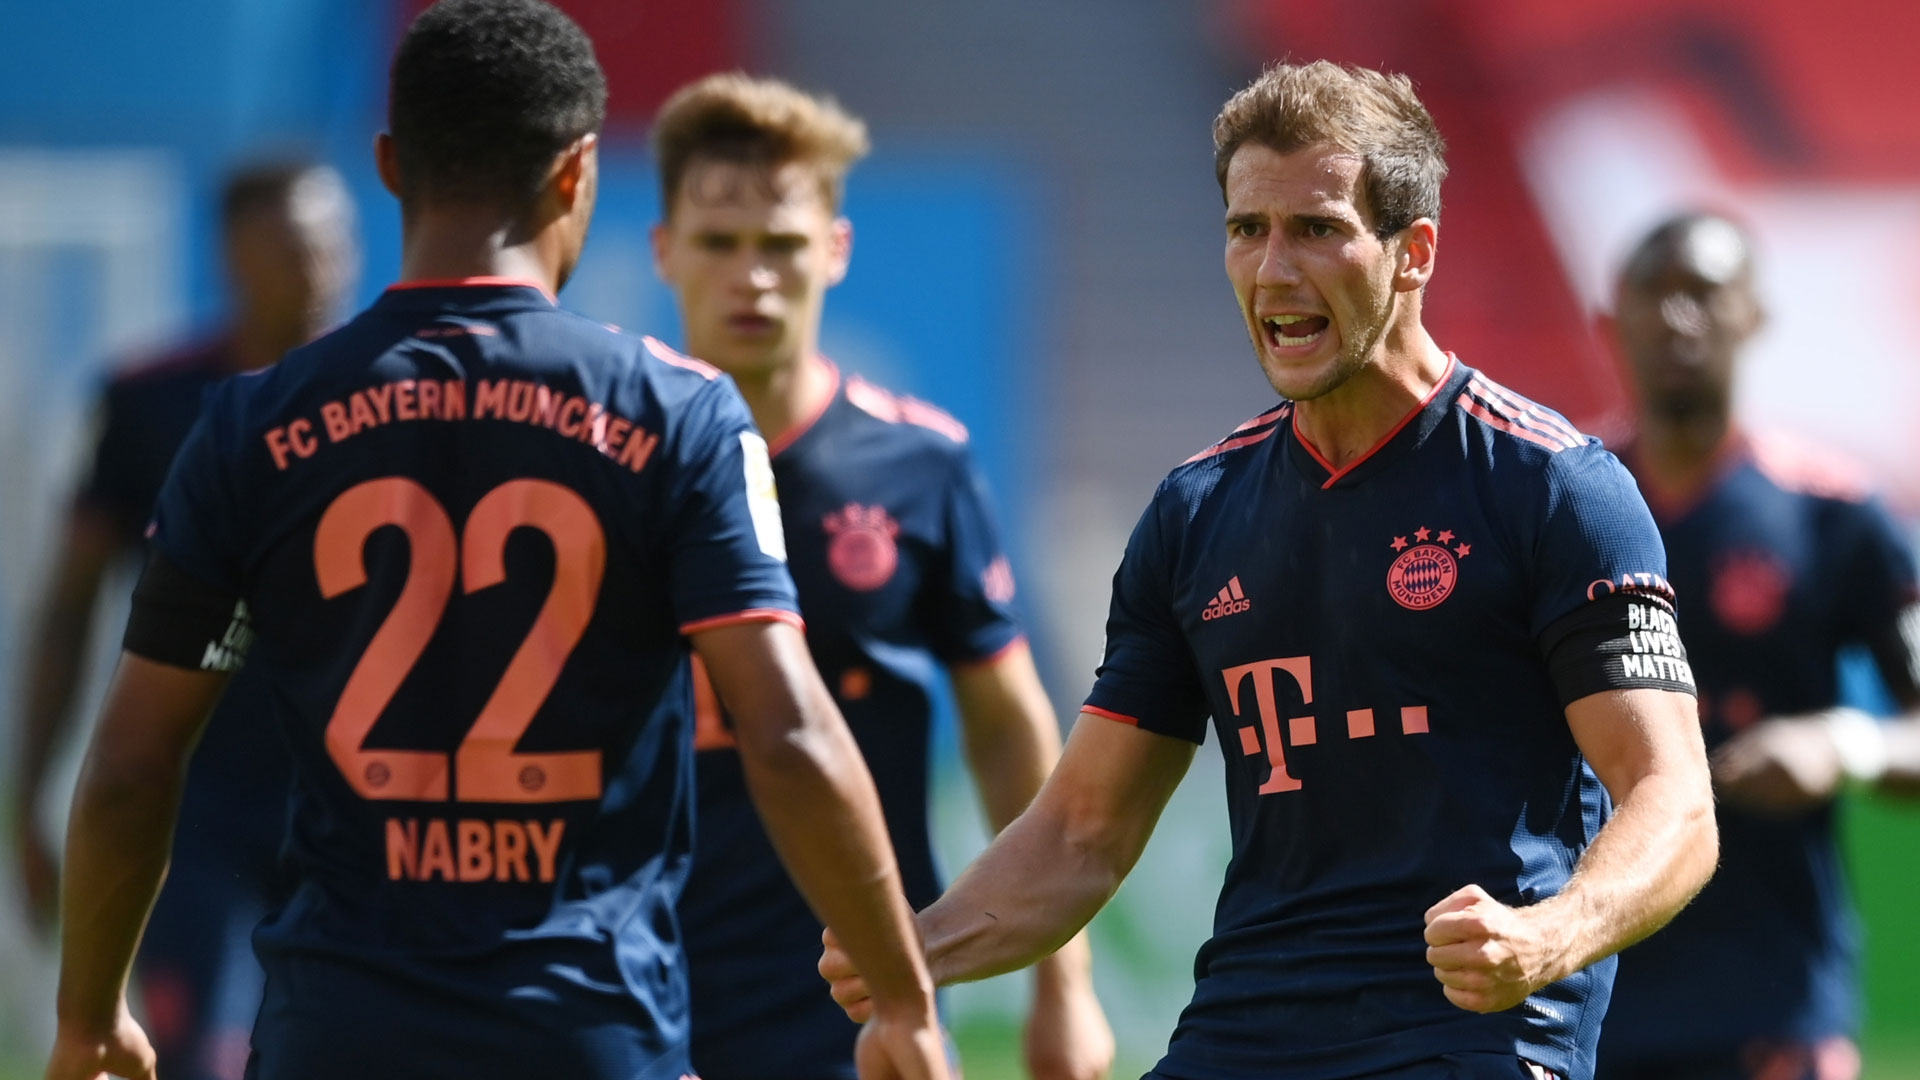 El Bayern Münich no tuvo piedad y aplastó 4-2 al Bayern Leverkusen. Foto: Twitter Bayern Münich